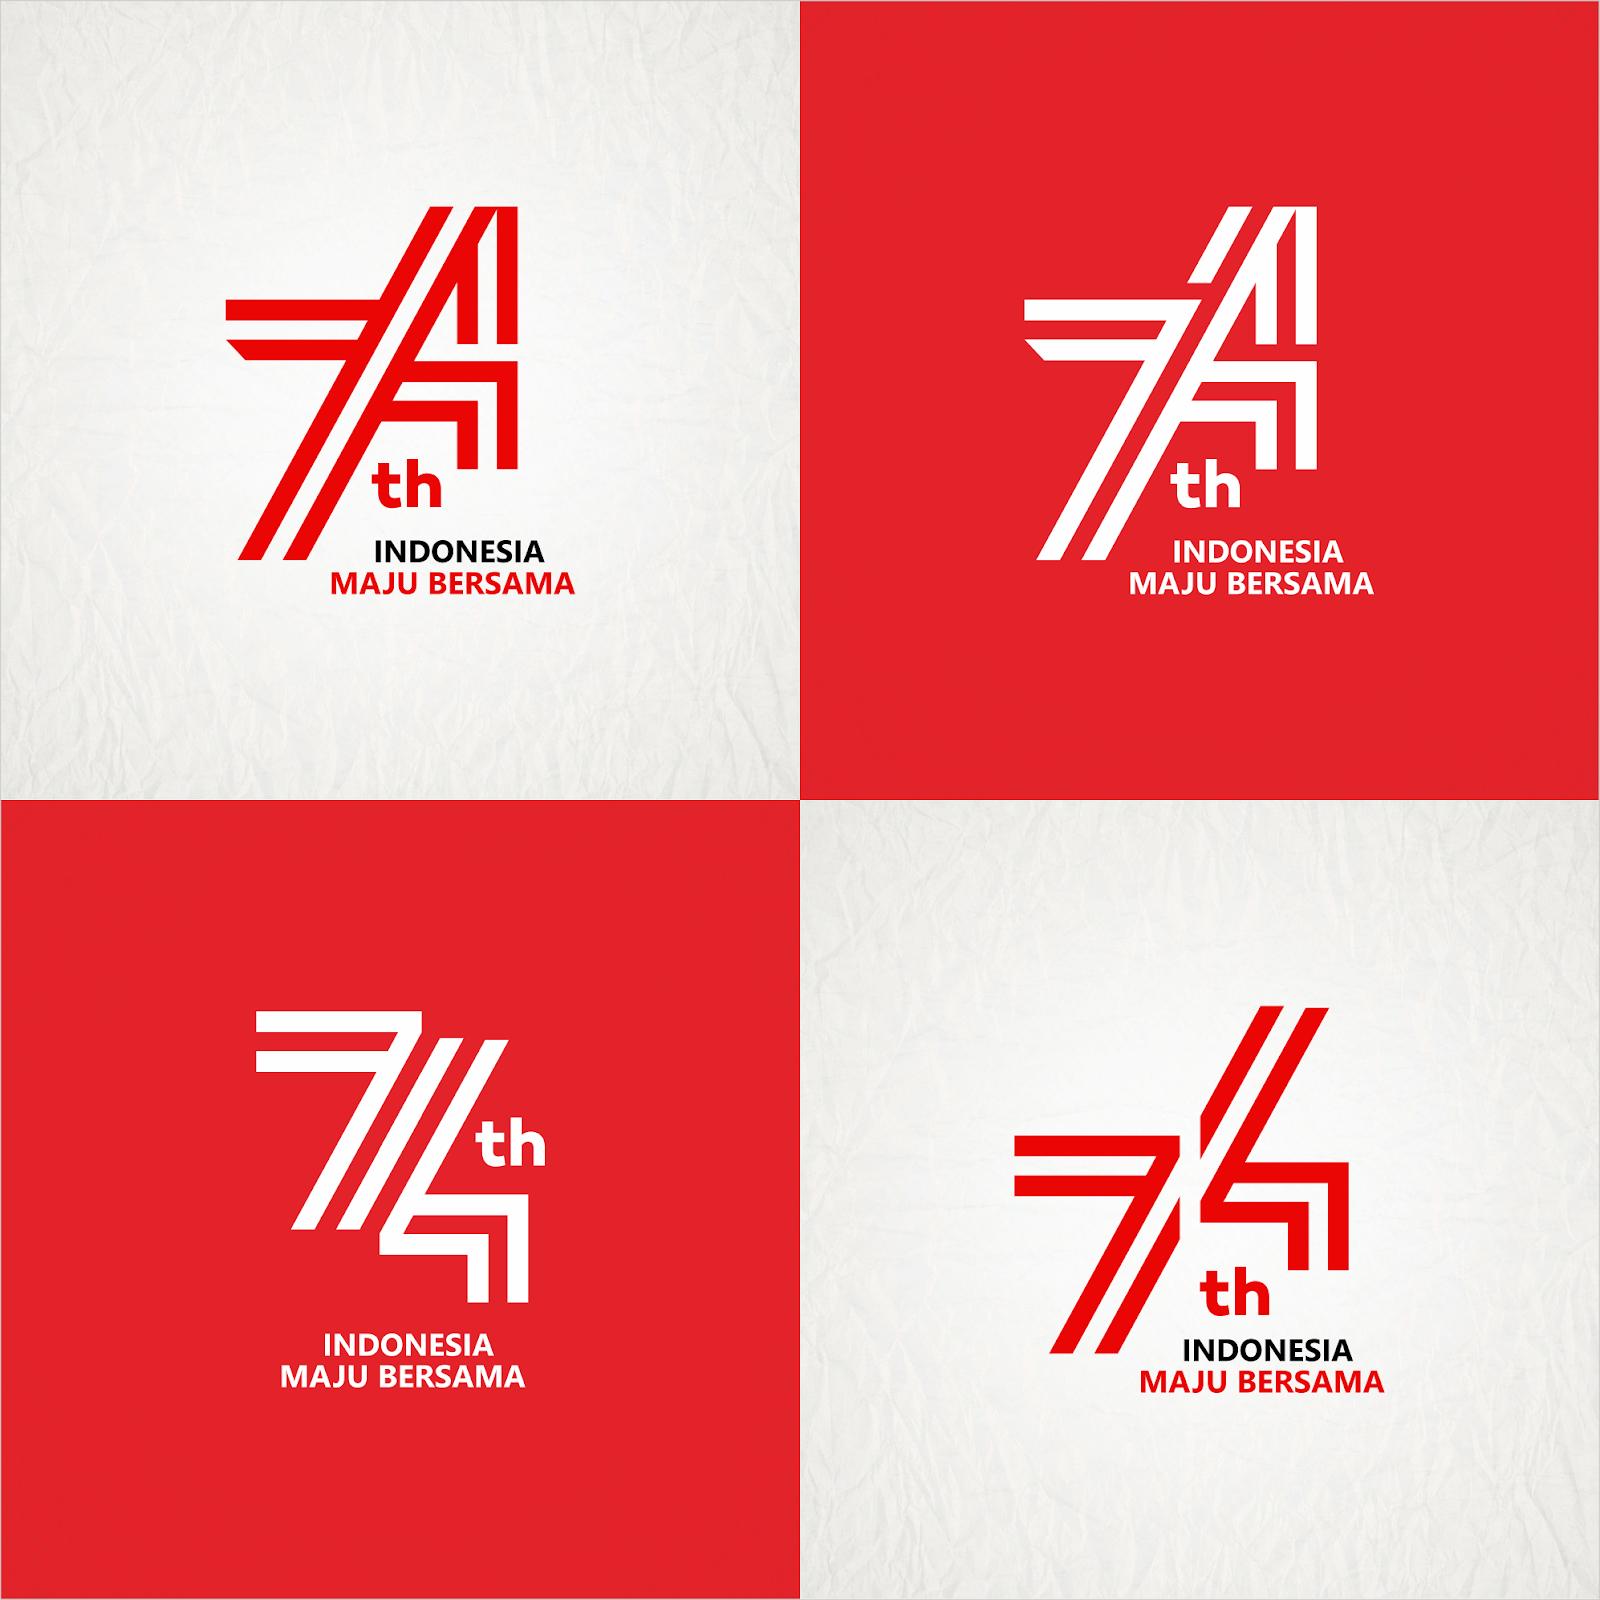 HUT RI 74 INDONESIA MAJU BERSAMA Logo vector (.cdr) - BlogoVector